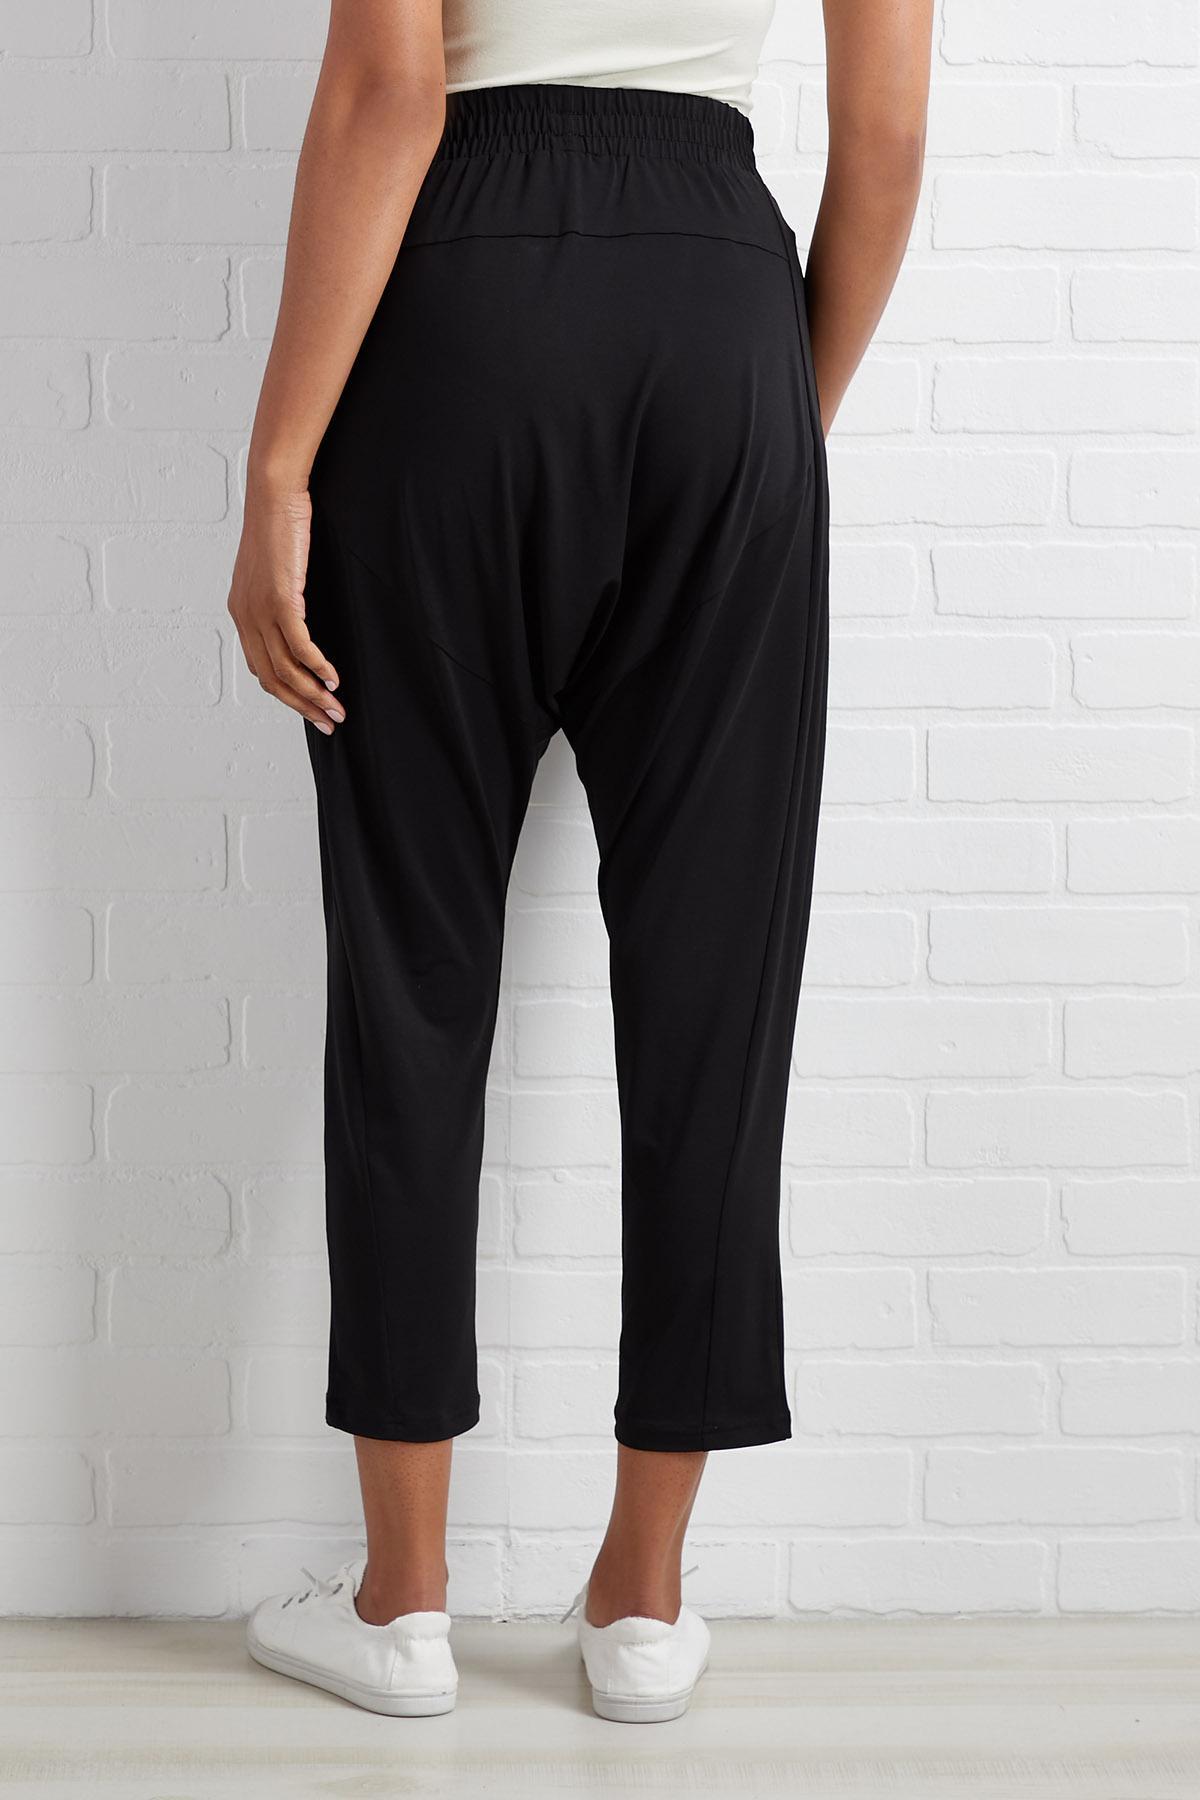 Short Sighted Pants